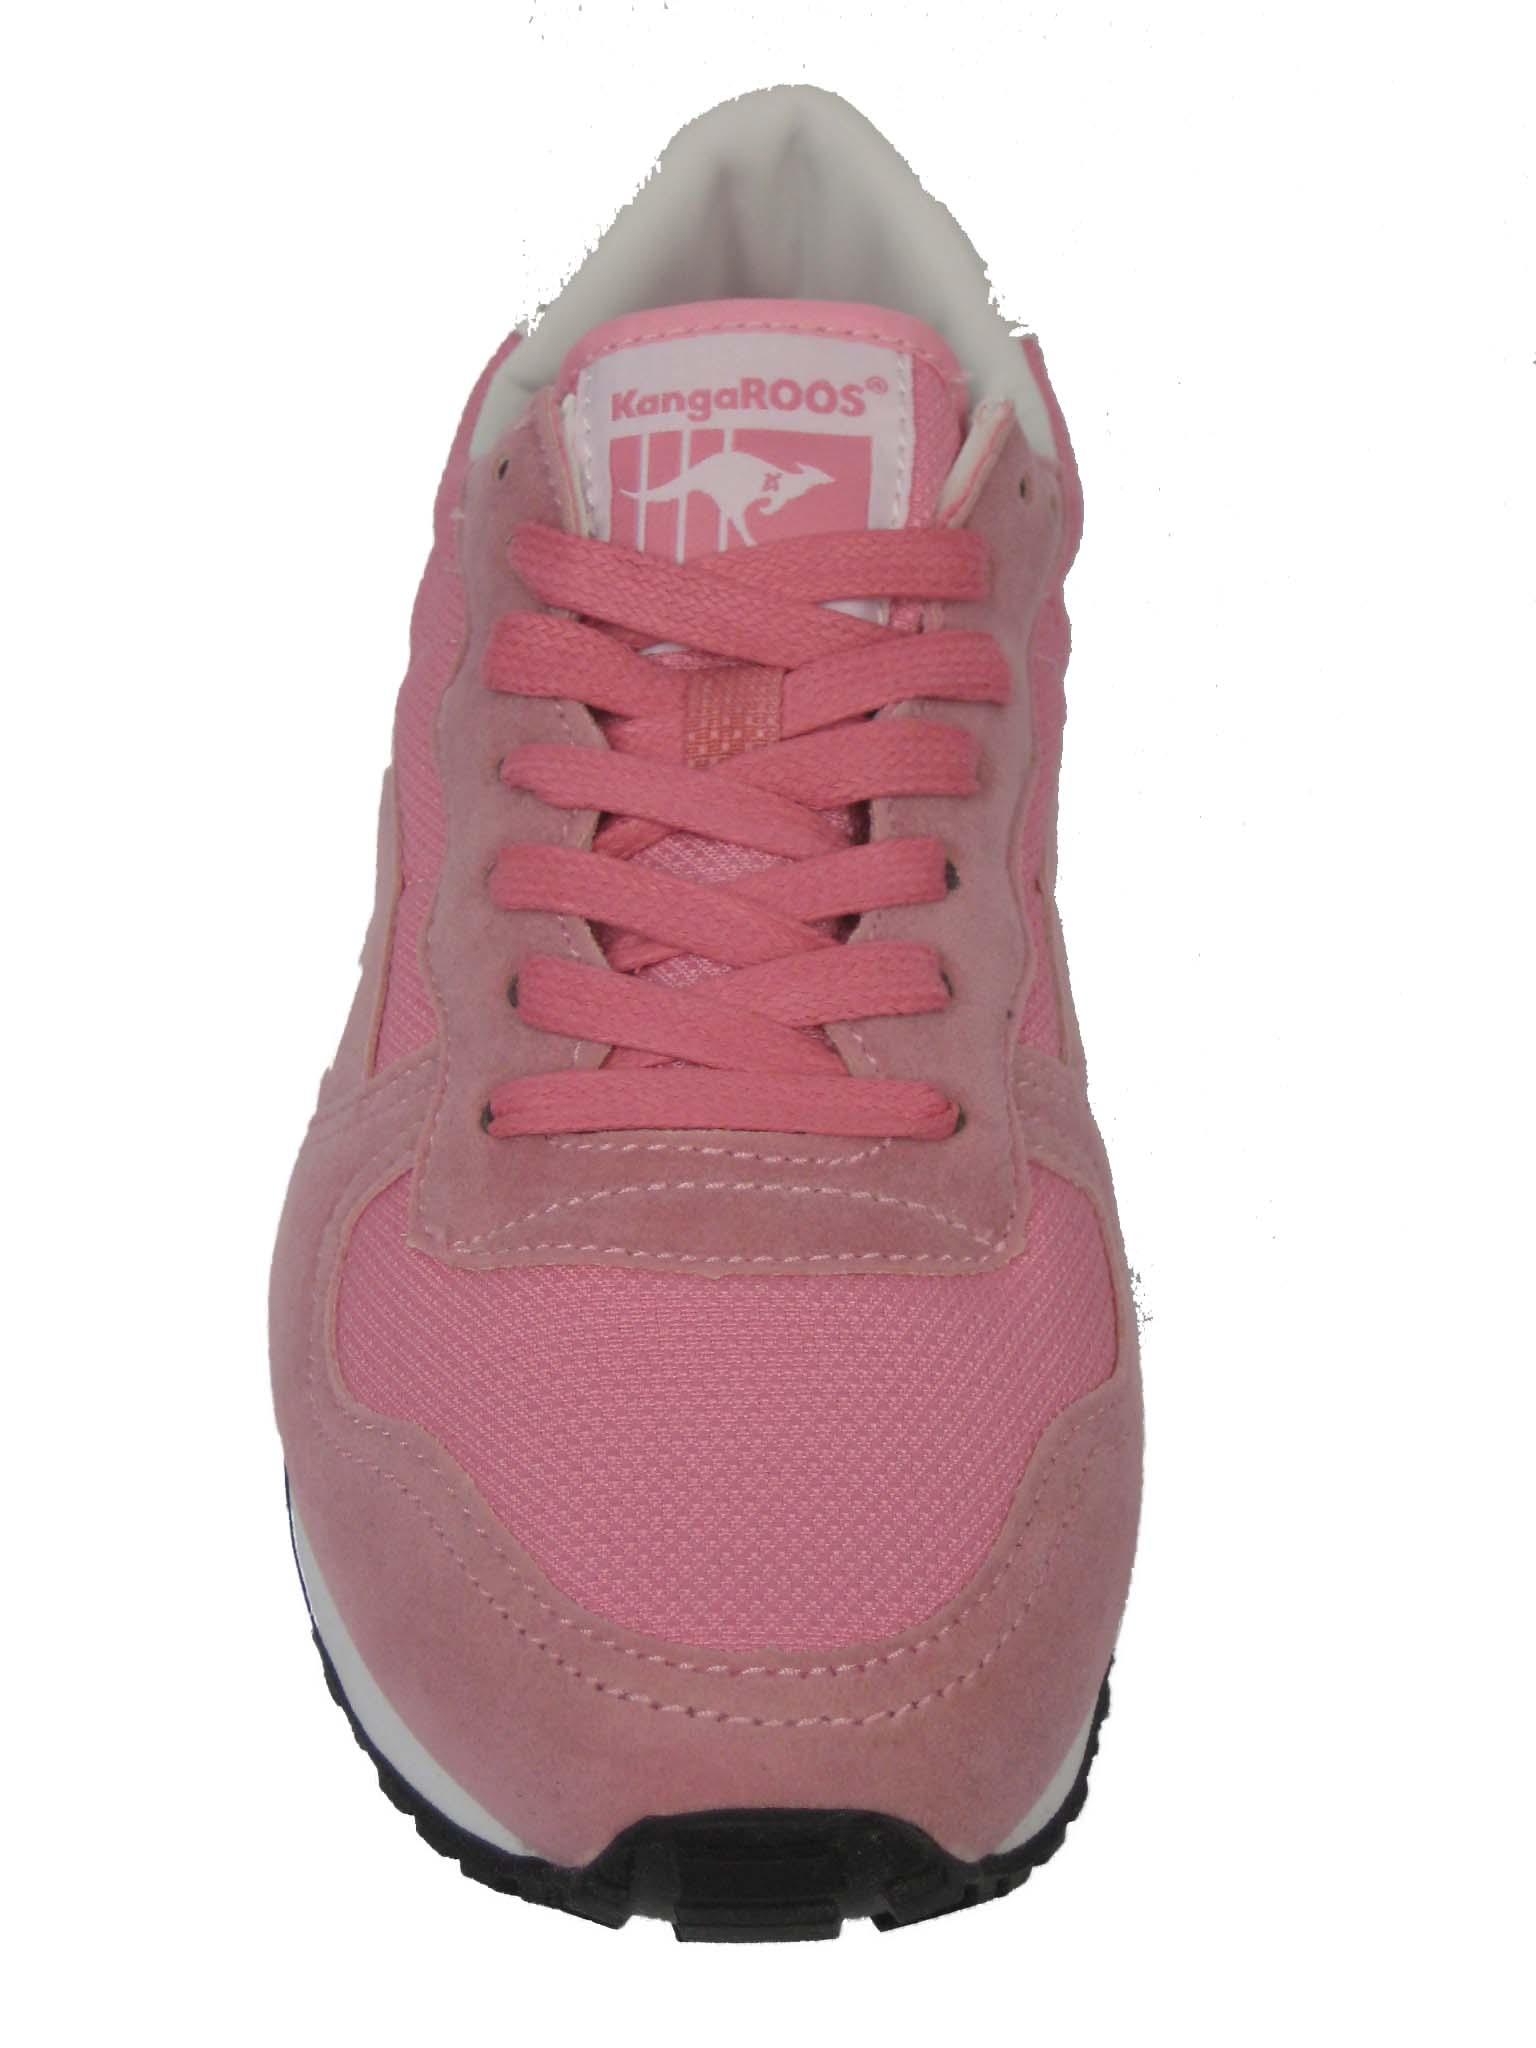 KangaROOS Damen Schuh Sneaker Laufschuh 47105 Invader-Basic blue blau türkis